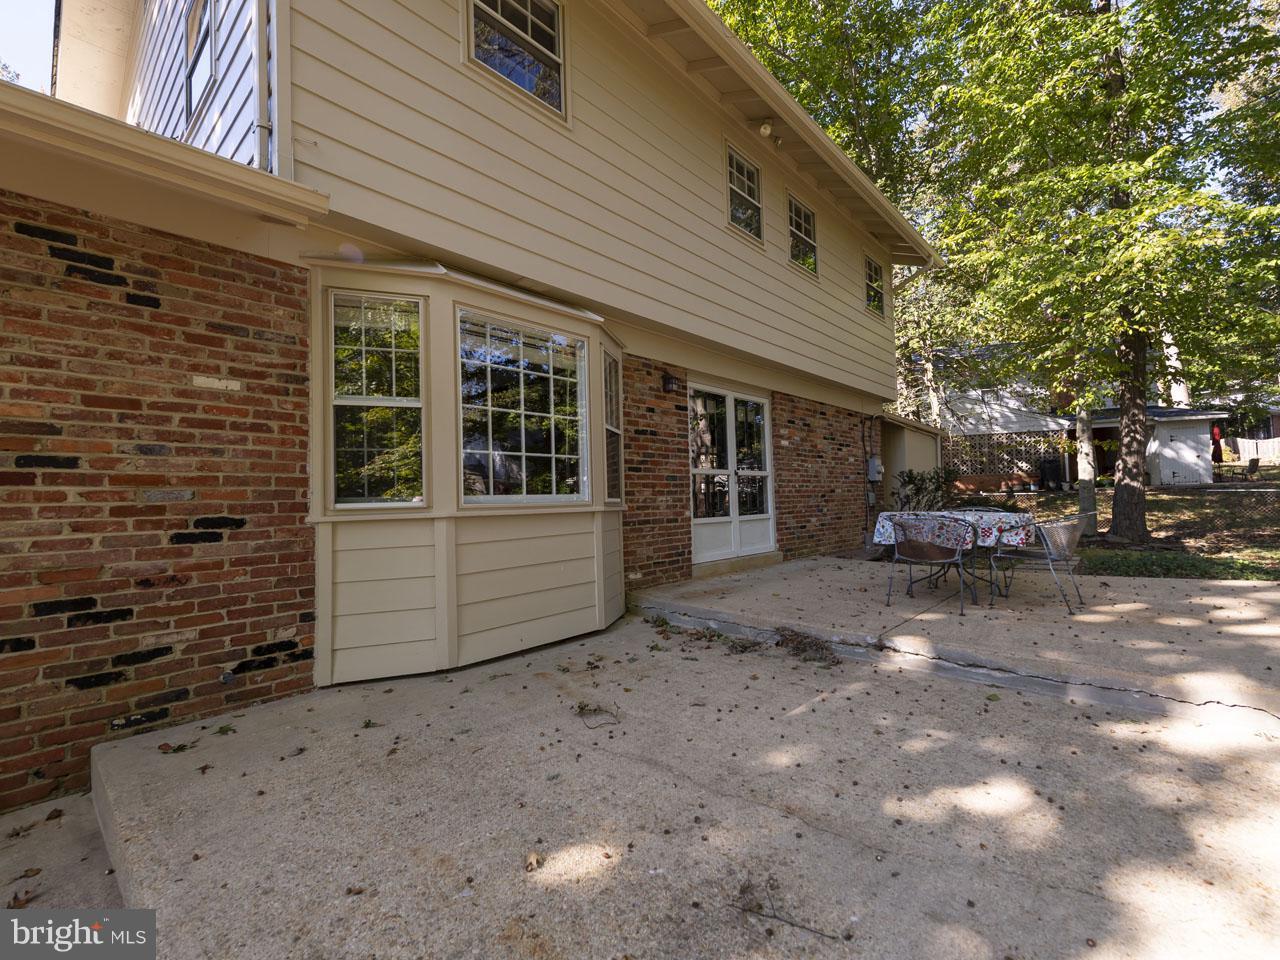 1010014728-300953035323-2021-09-05-13-50-25  |   | Annandale Delaware Real Estate For Sale | MLS# 1010014728  - Best of Northern Virginia